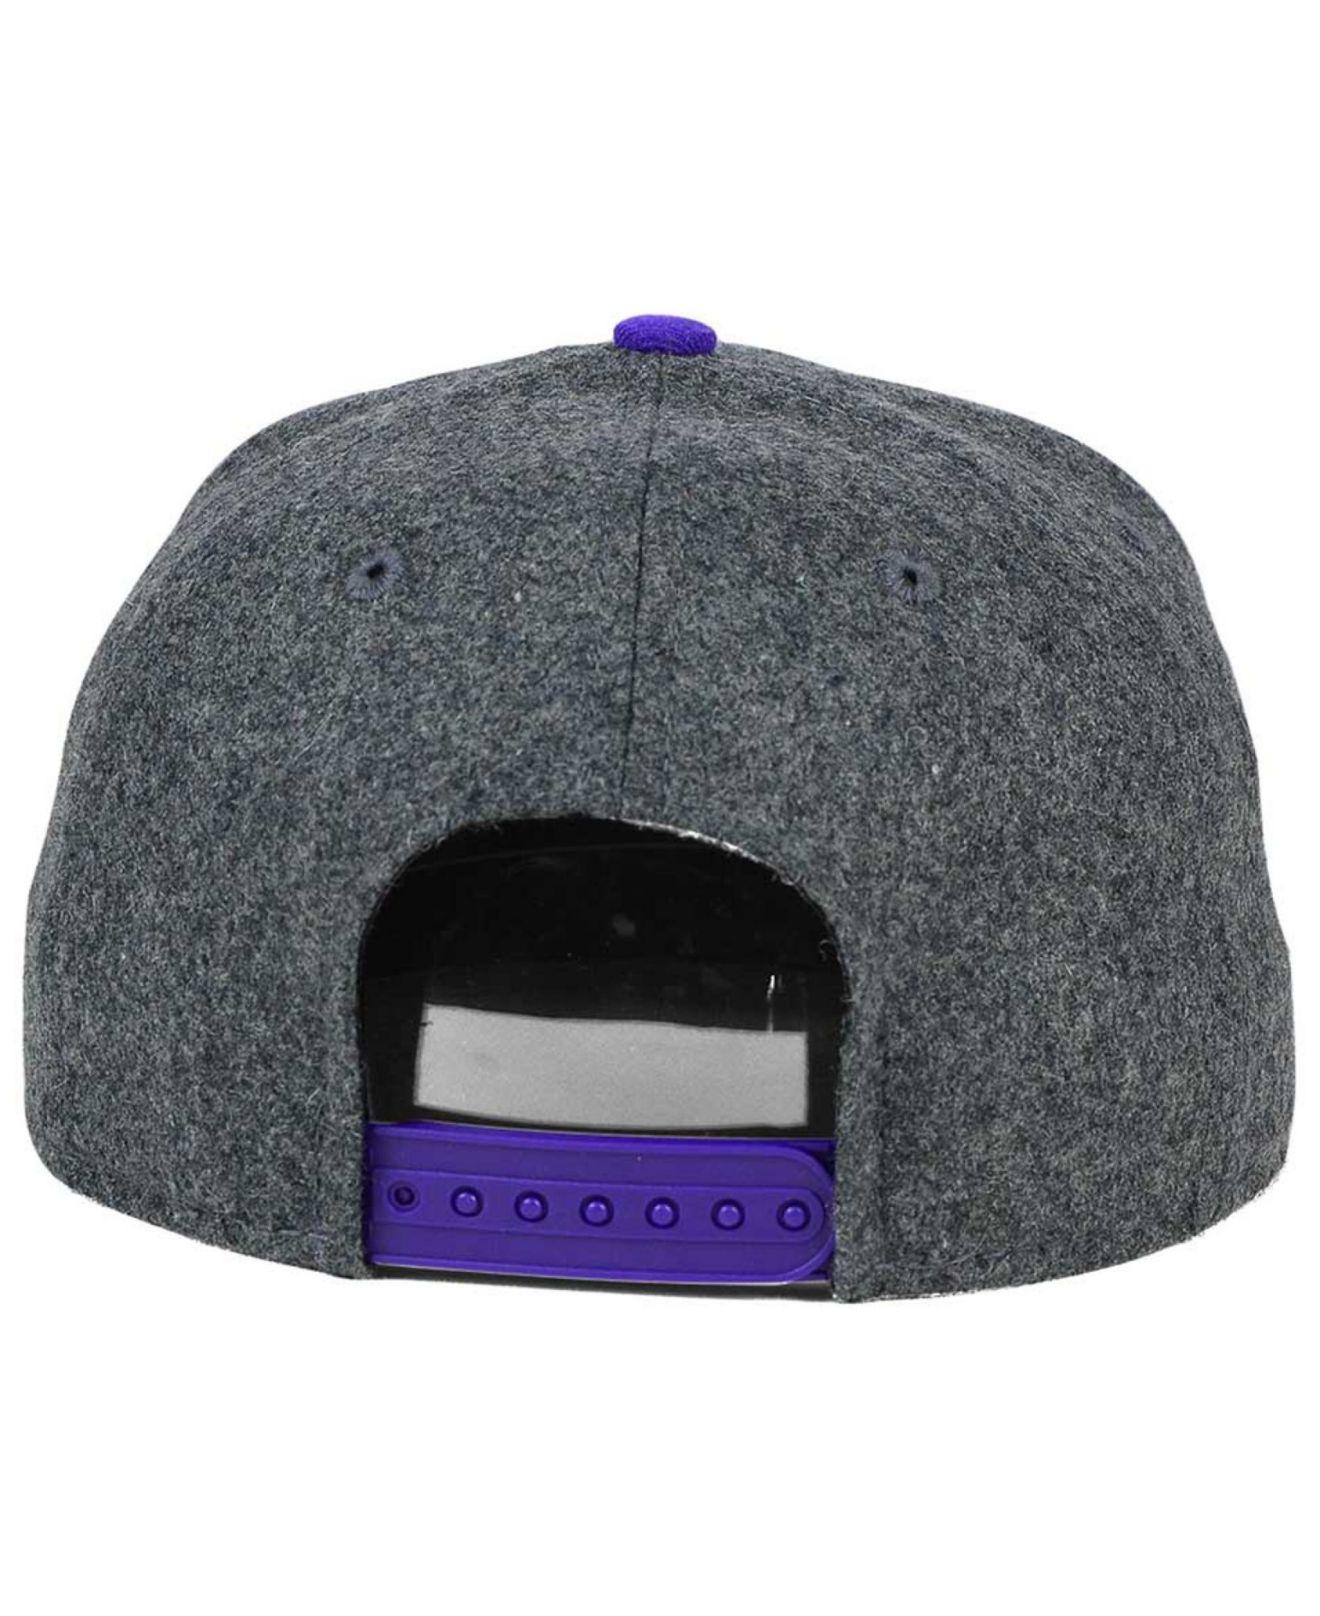 Lyst - Ktz Minnesota Vikings Shader Melt 9fifty Snapback Cap in Gray ... d1060e75a